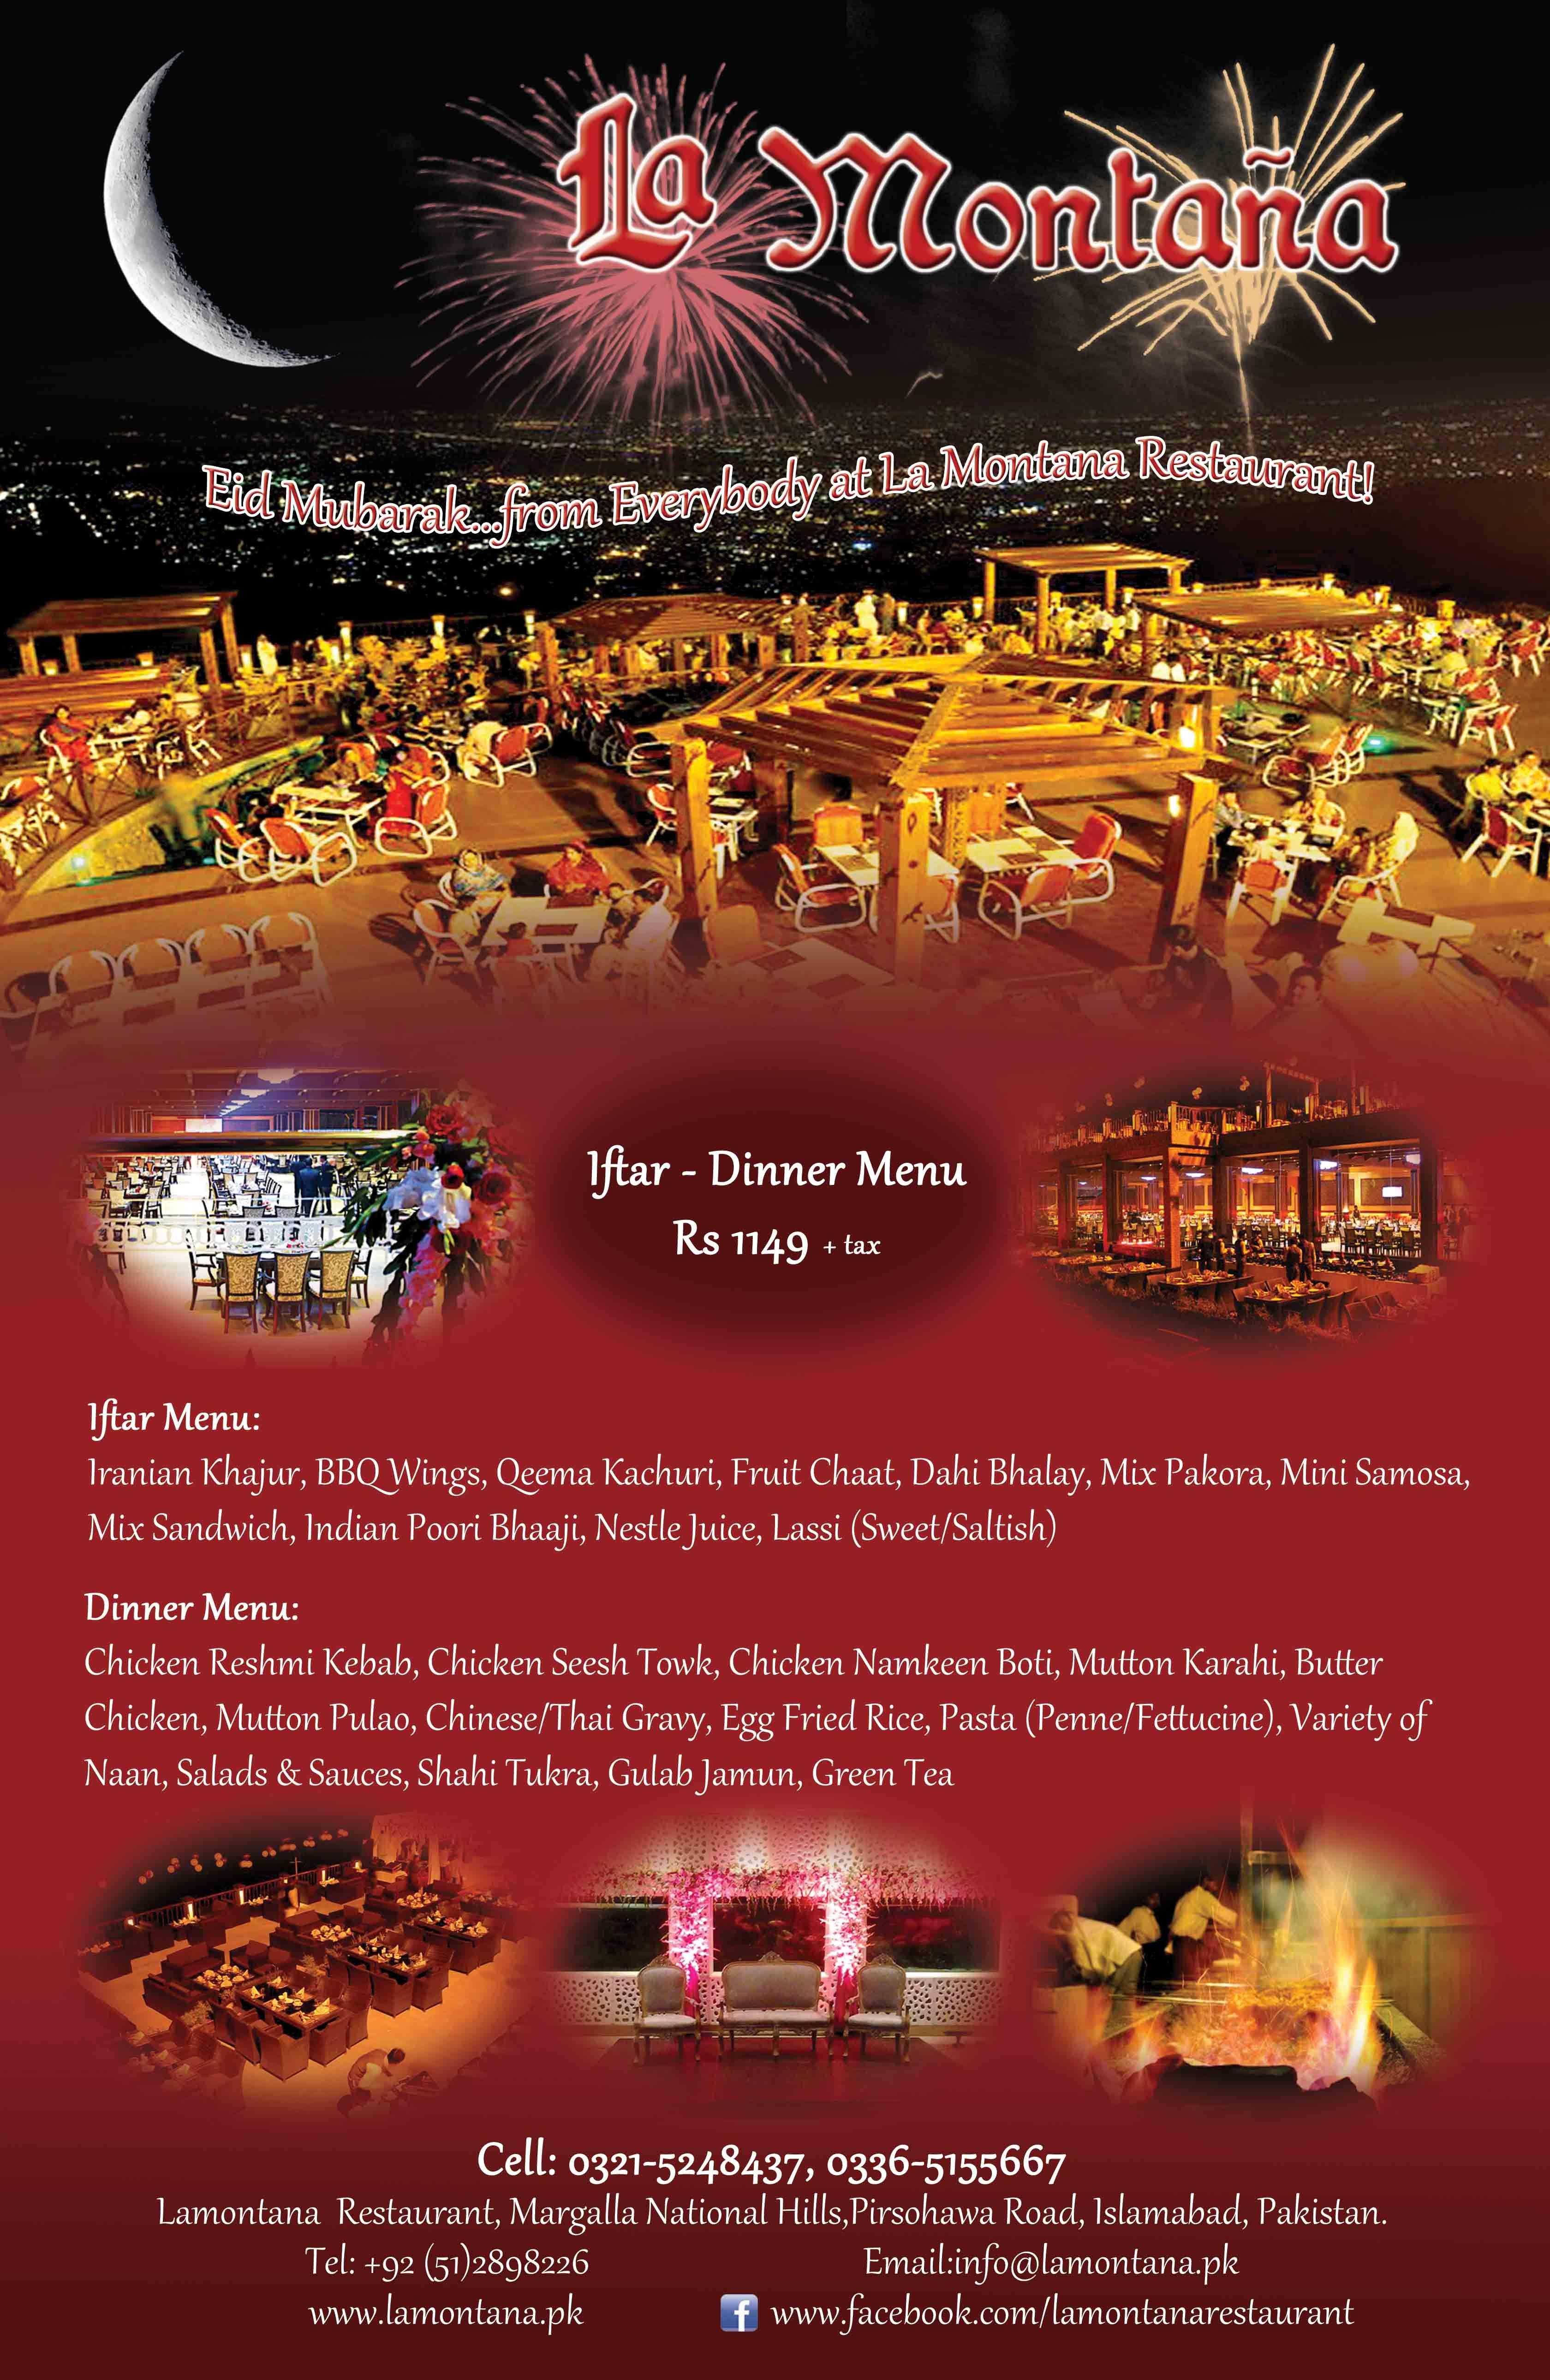 La Montana Restaurant Pir Sohawa Islamabad Iftar And Dinner Menu Dinner Menu Iftar Reshmi Kebab